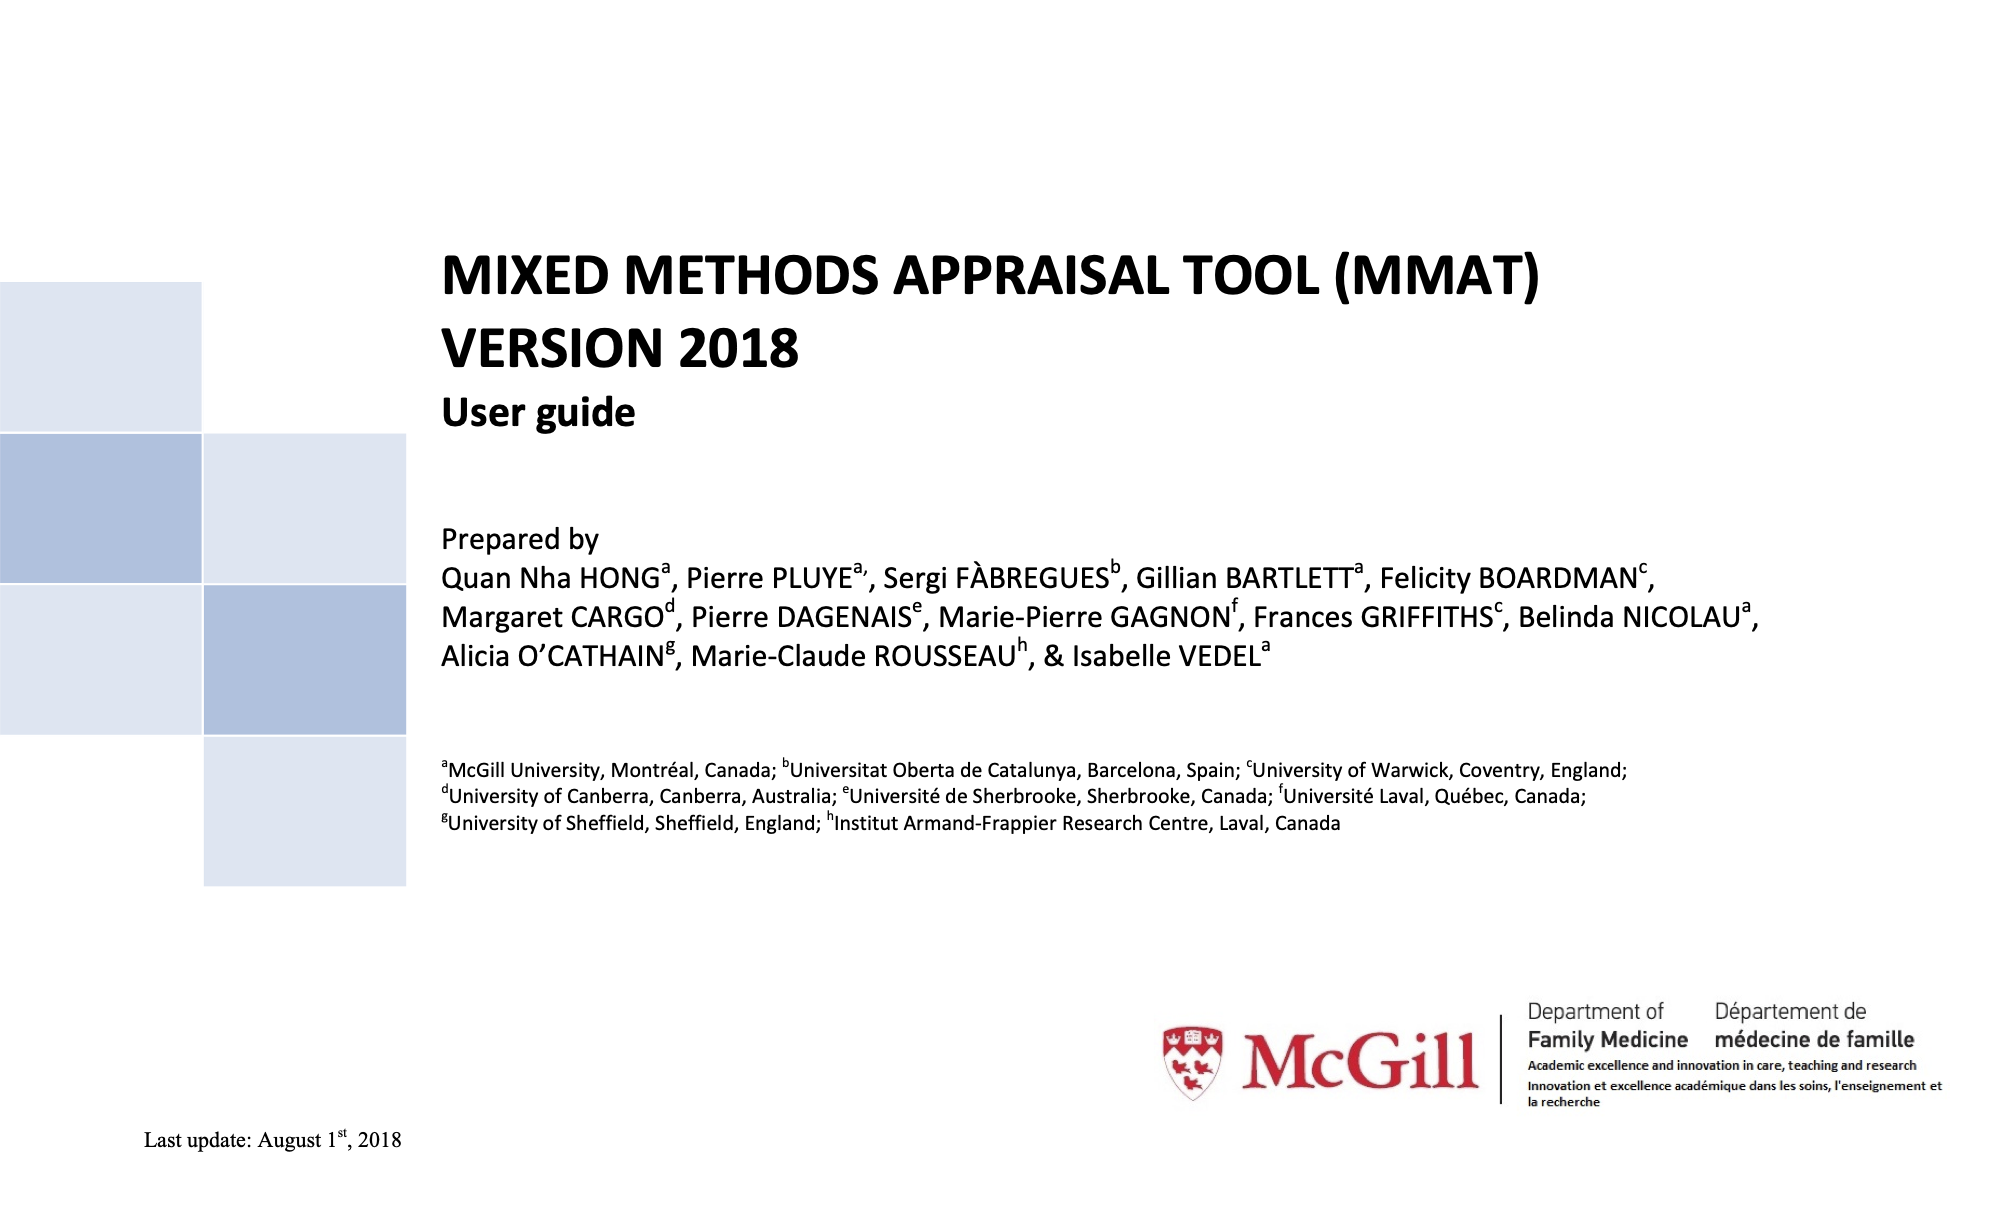 Mixed Methods Appraisal Tool (MMAT) Version 2018 User Guide